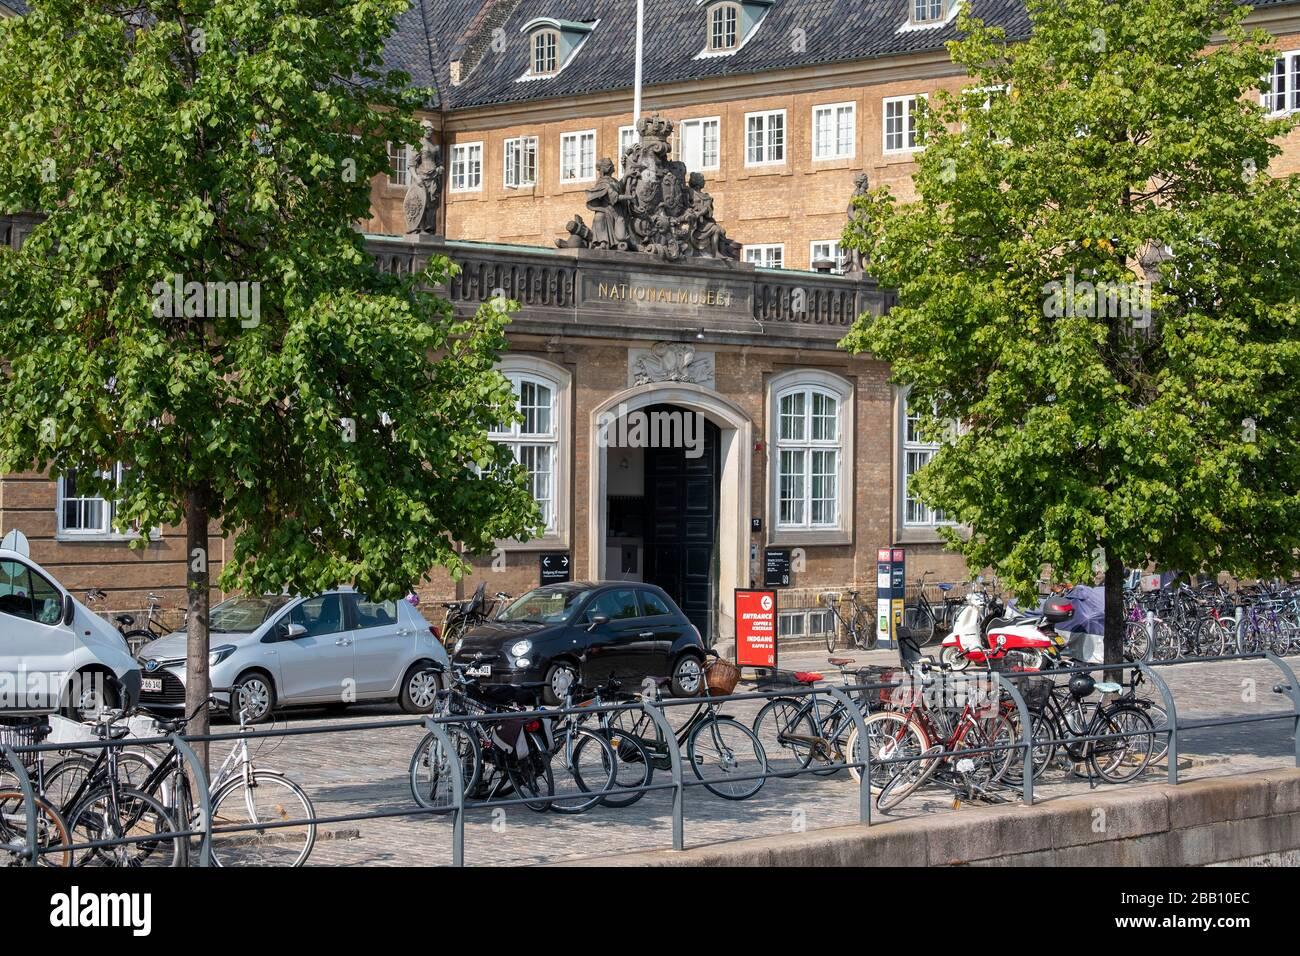 Museo Nacional de Dinamarca alias Nationalmuseet en Copenhague, Dinamarca, Europa Foto de stock